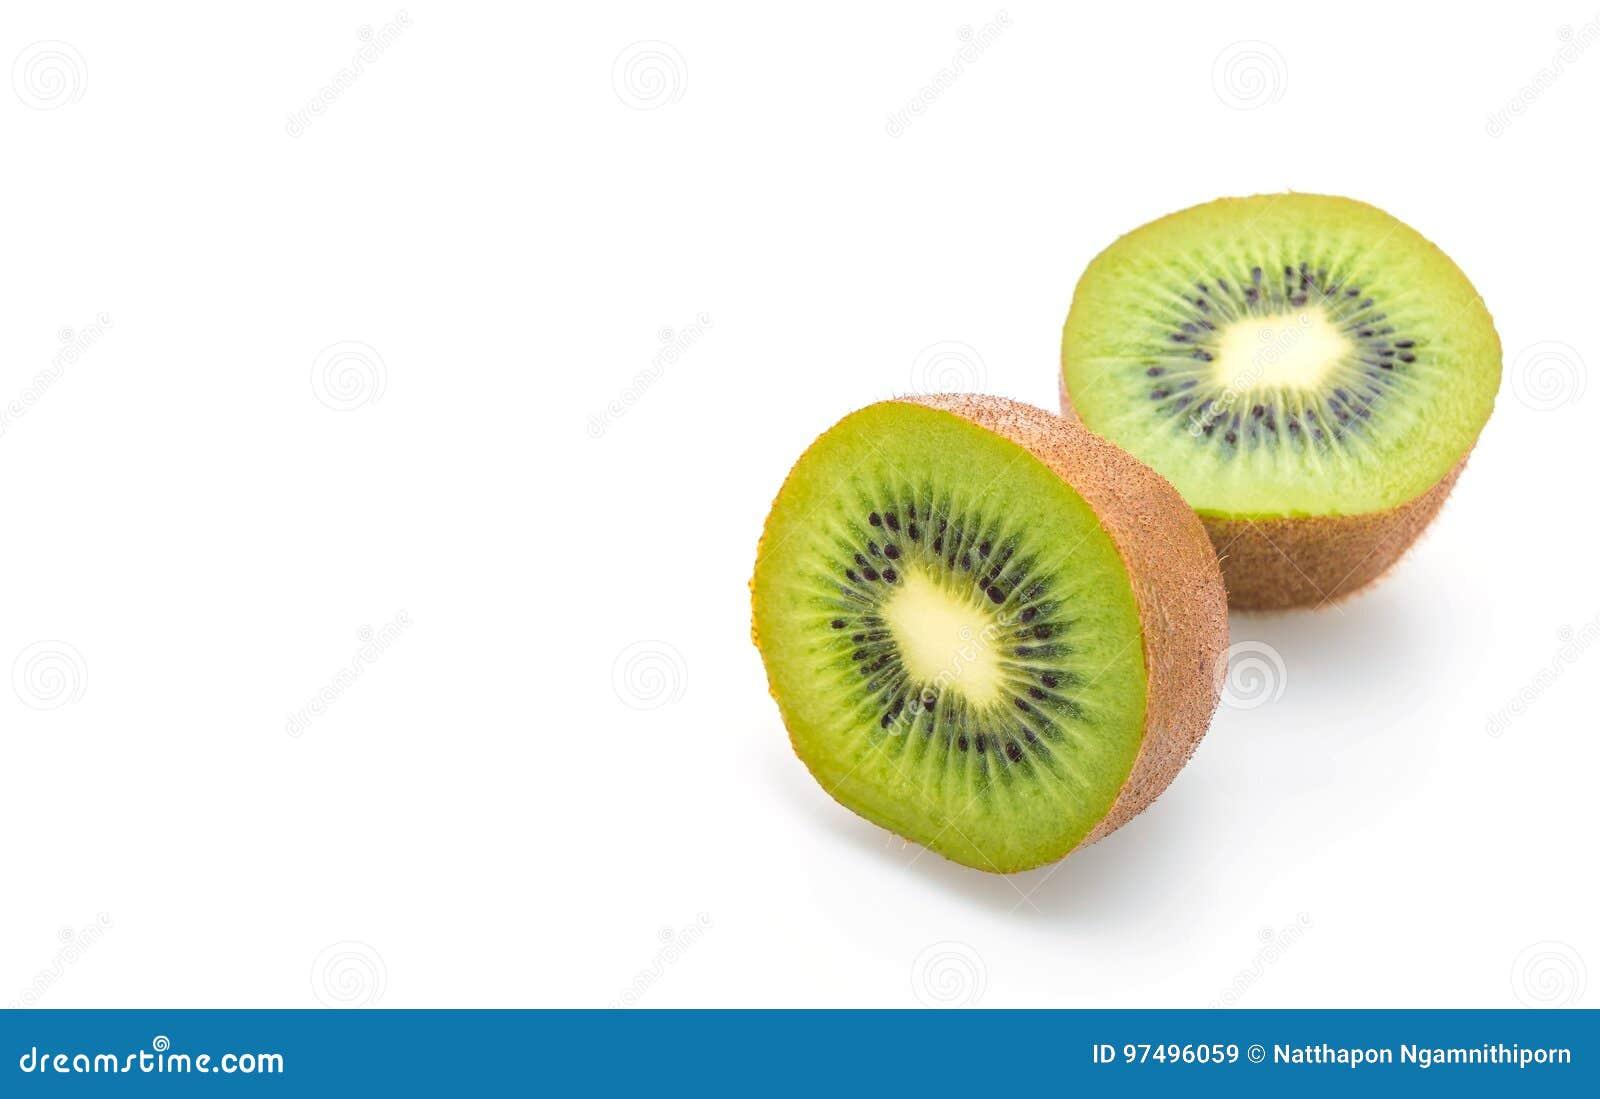 Kiwi fresco su bianco